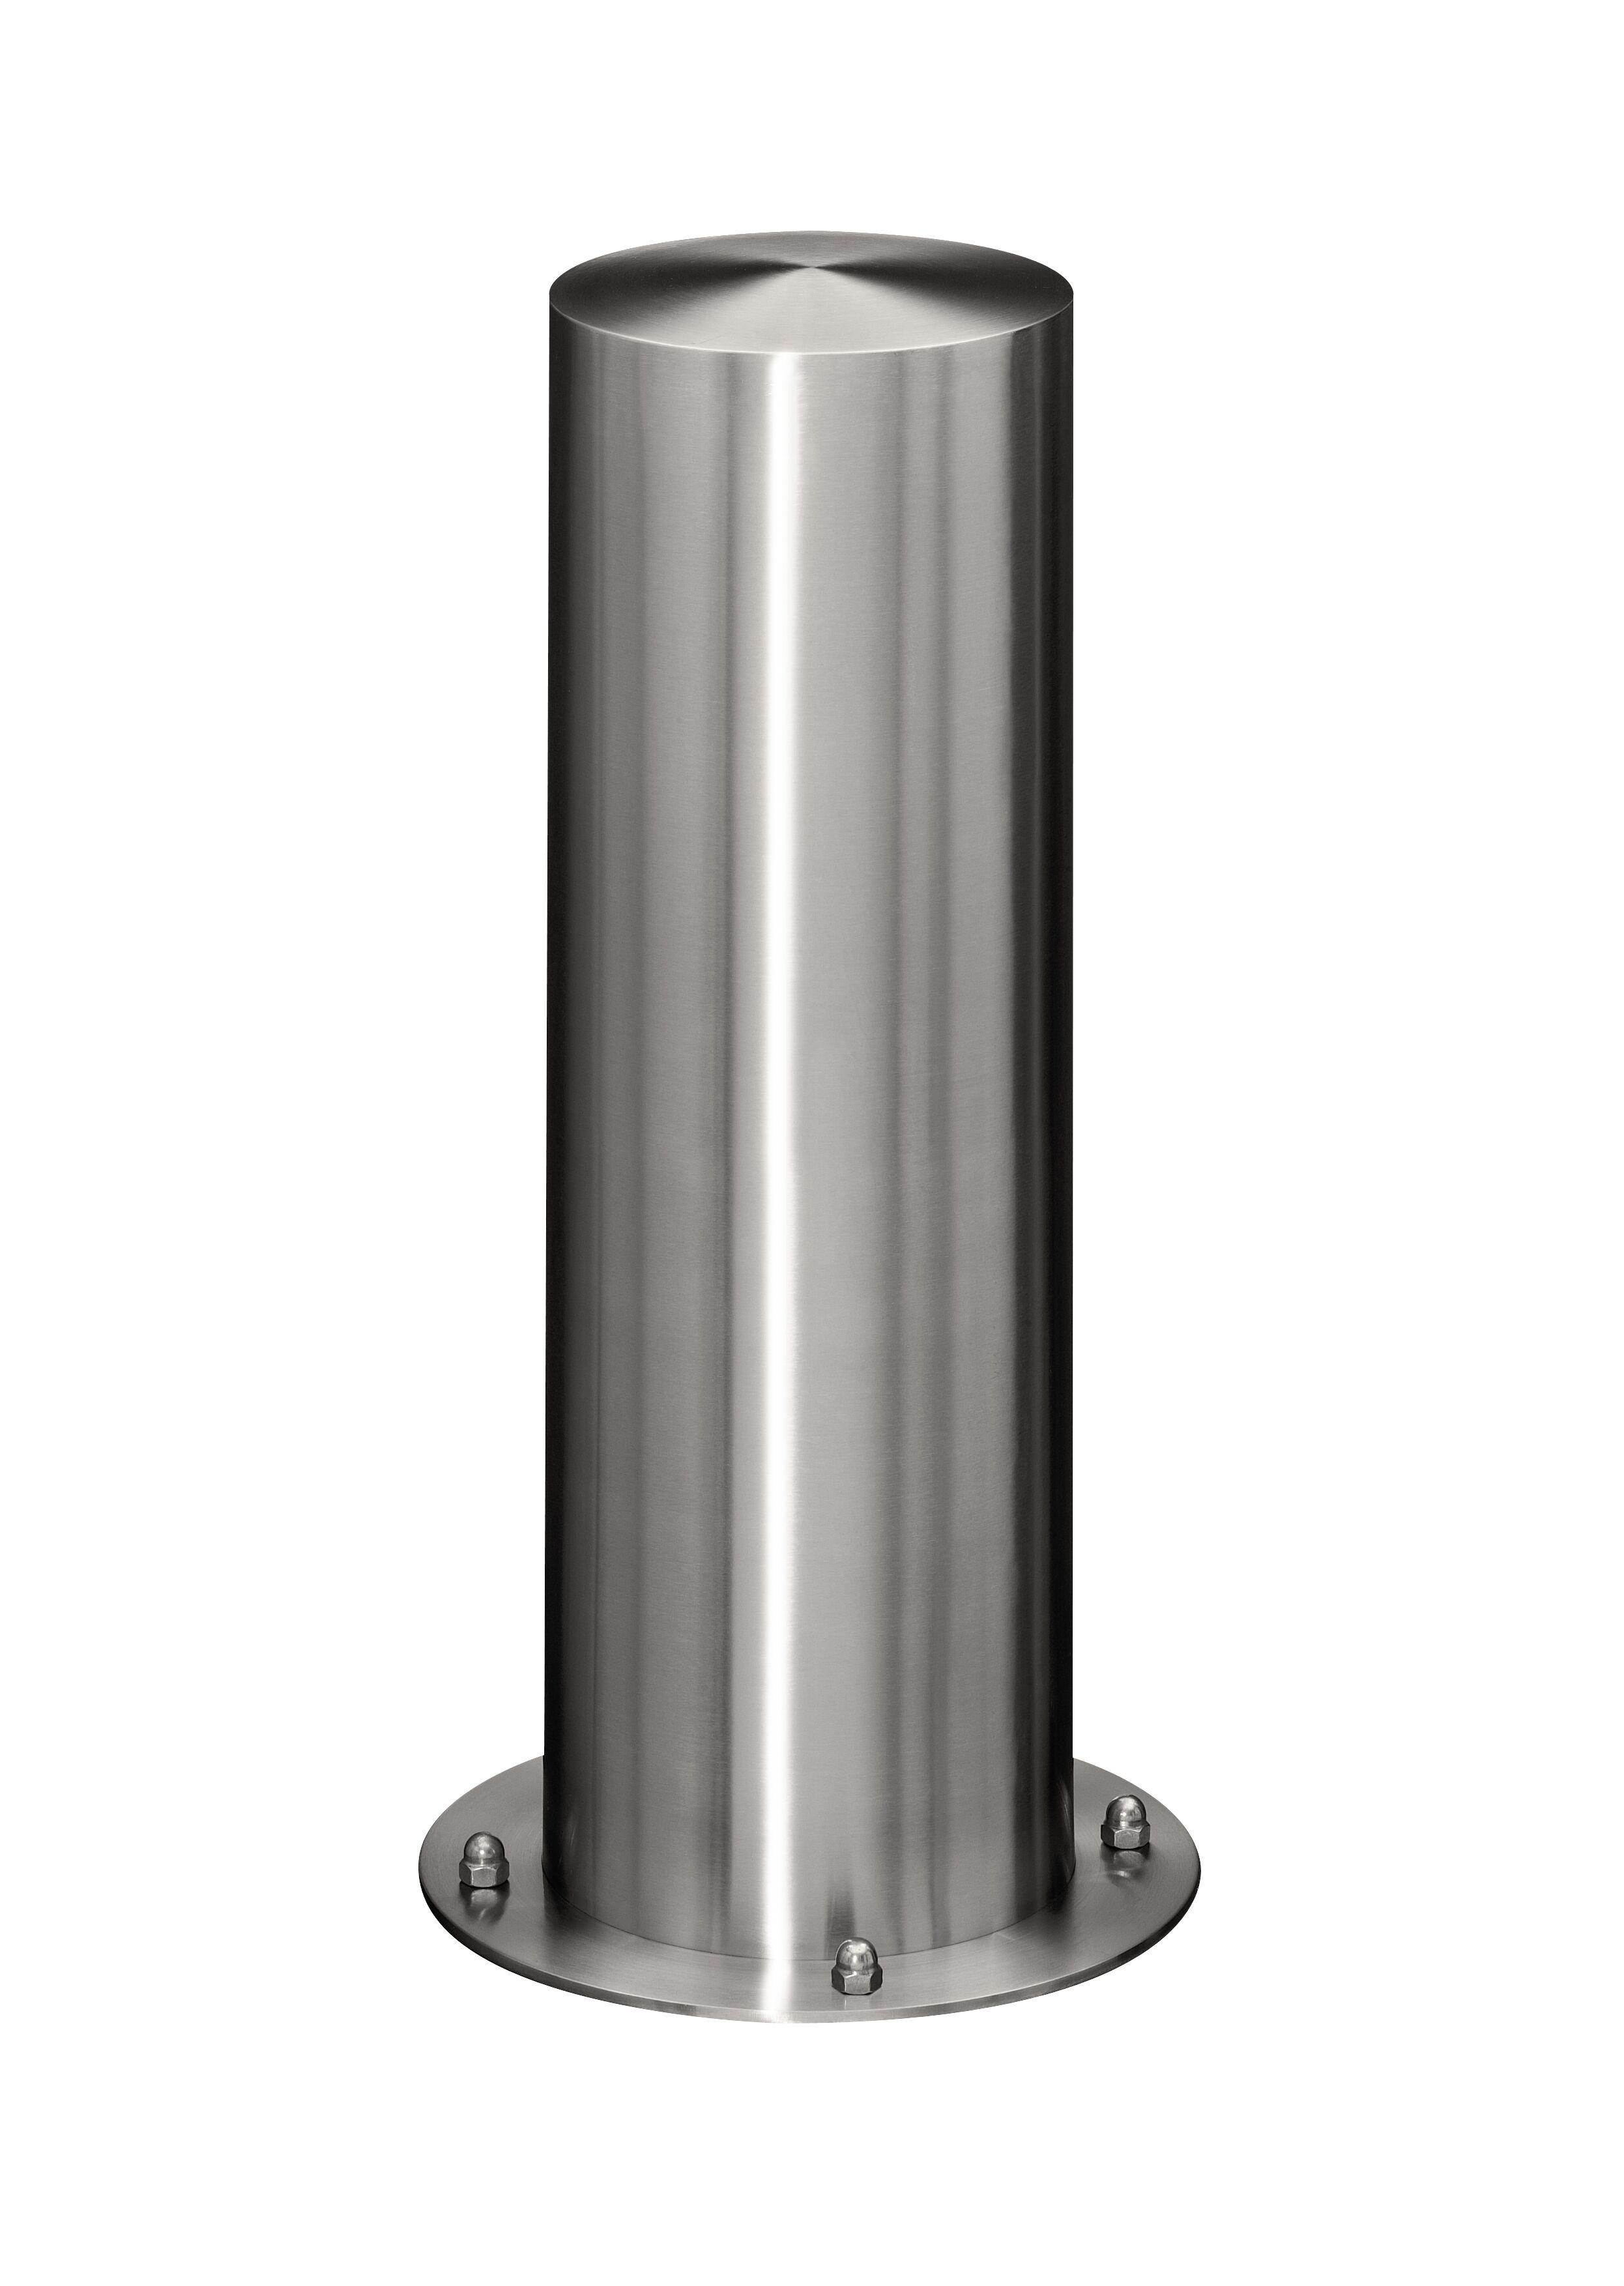 Absperrpfosten aus Edelstahl | Ø 205 mm x 600 mm